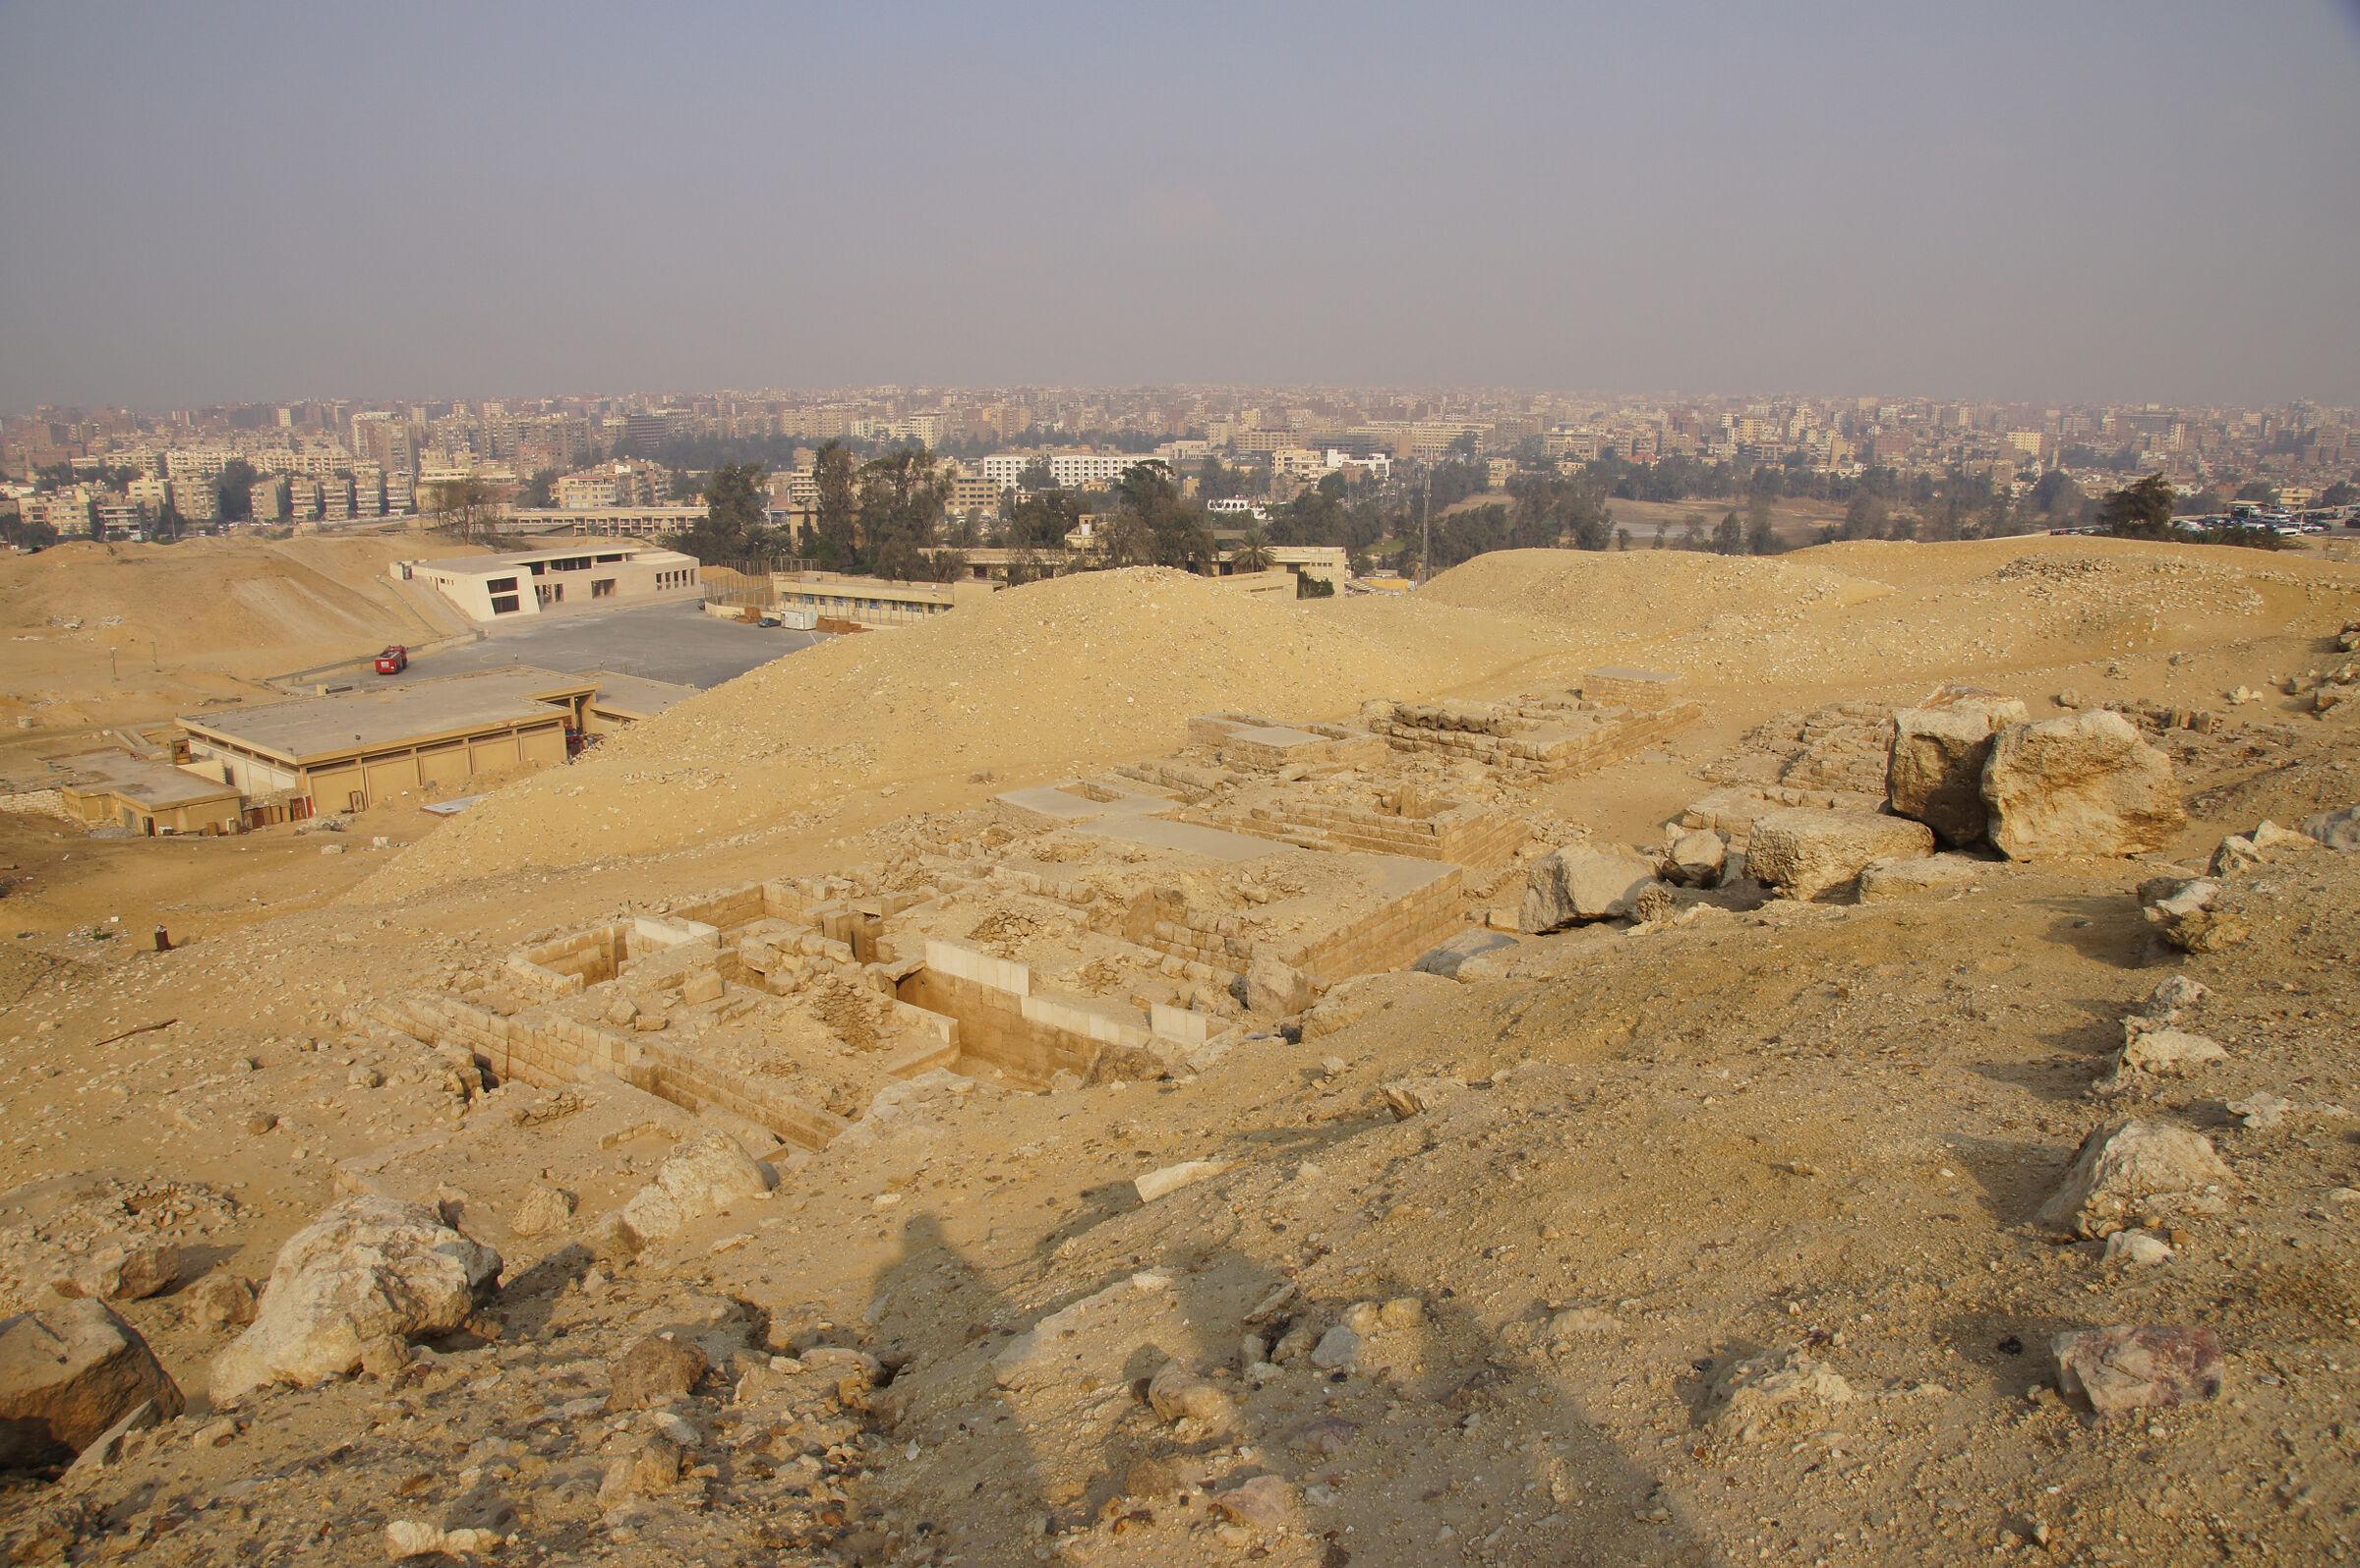 Western Cemetery: Site: Giza; View: G 2095, G 2094, G 2092+2093, G 2096, G 2097, G 2091, G 2088, G 2230+2231